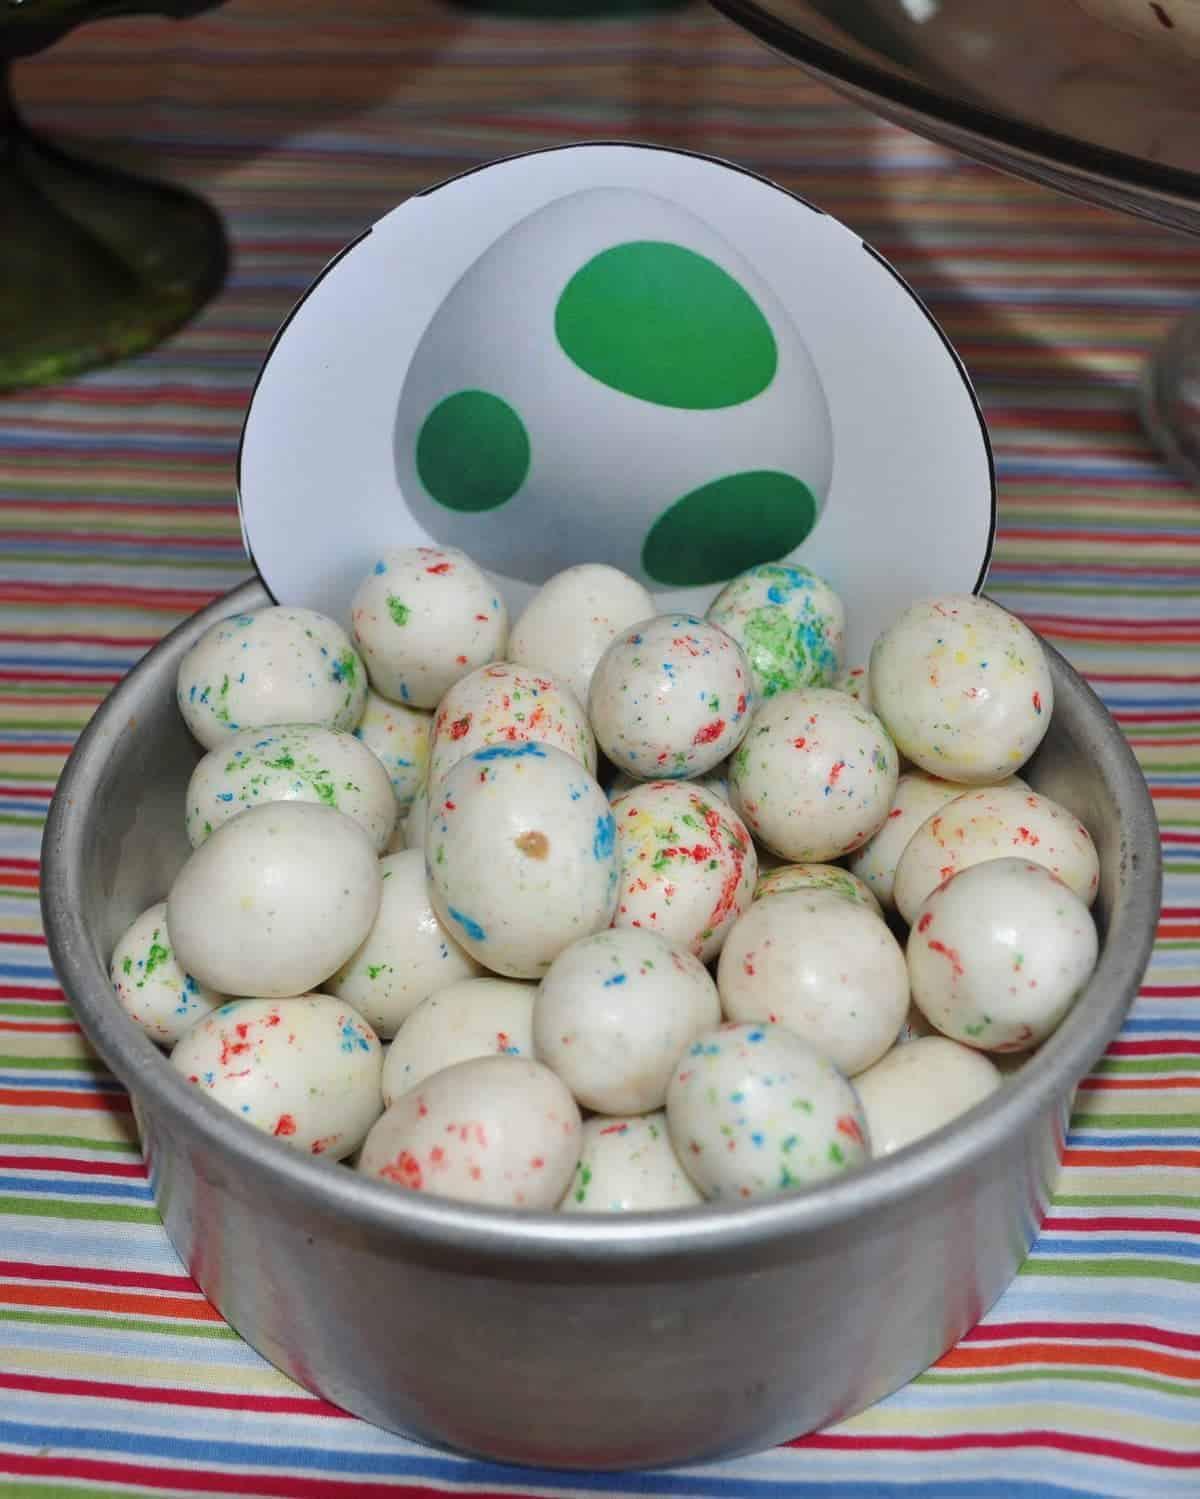 'yoshi eggs' white malted milk balls in a bowl